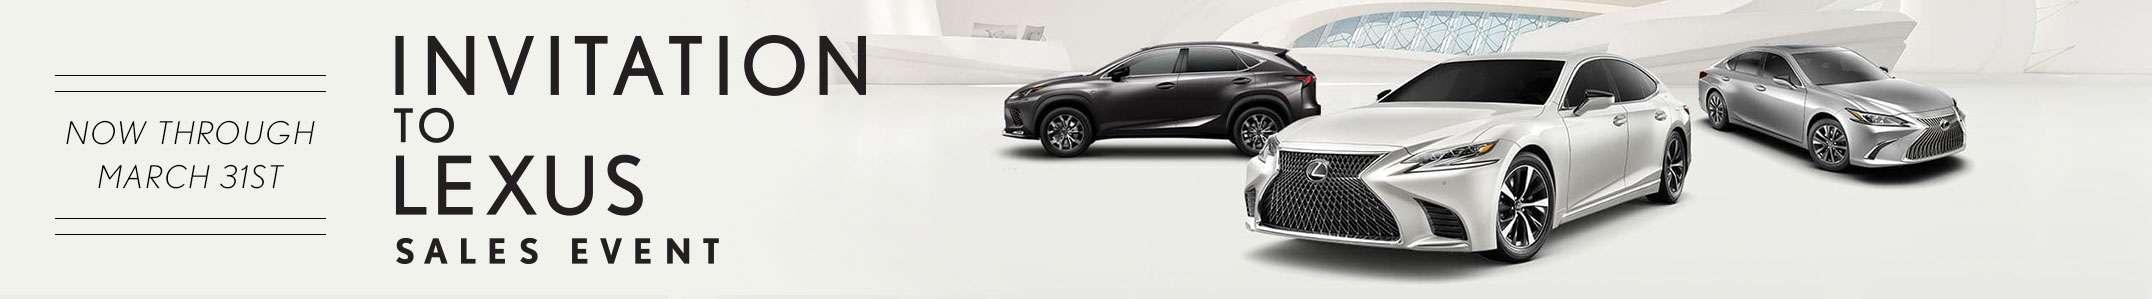 Lexus Sales Event Offers